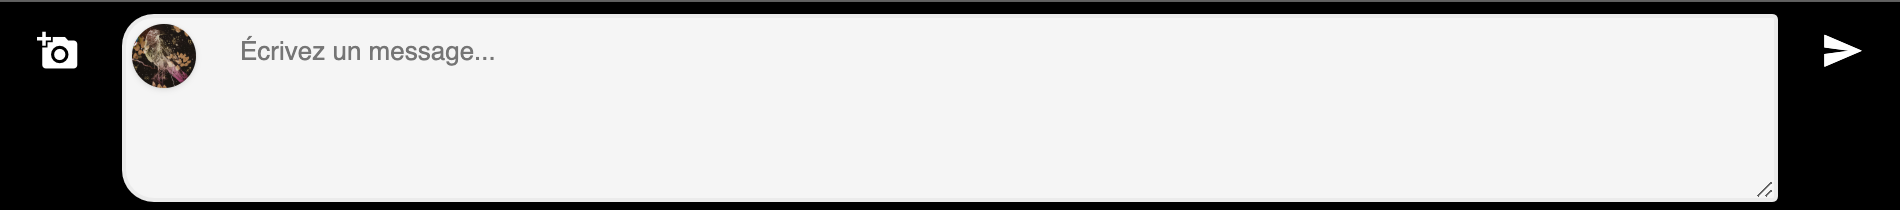 [AWESOMEBB] *RESOLU*Bouton prévisualiser dans la réponse rapide 6iAue3HP_o